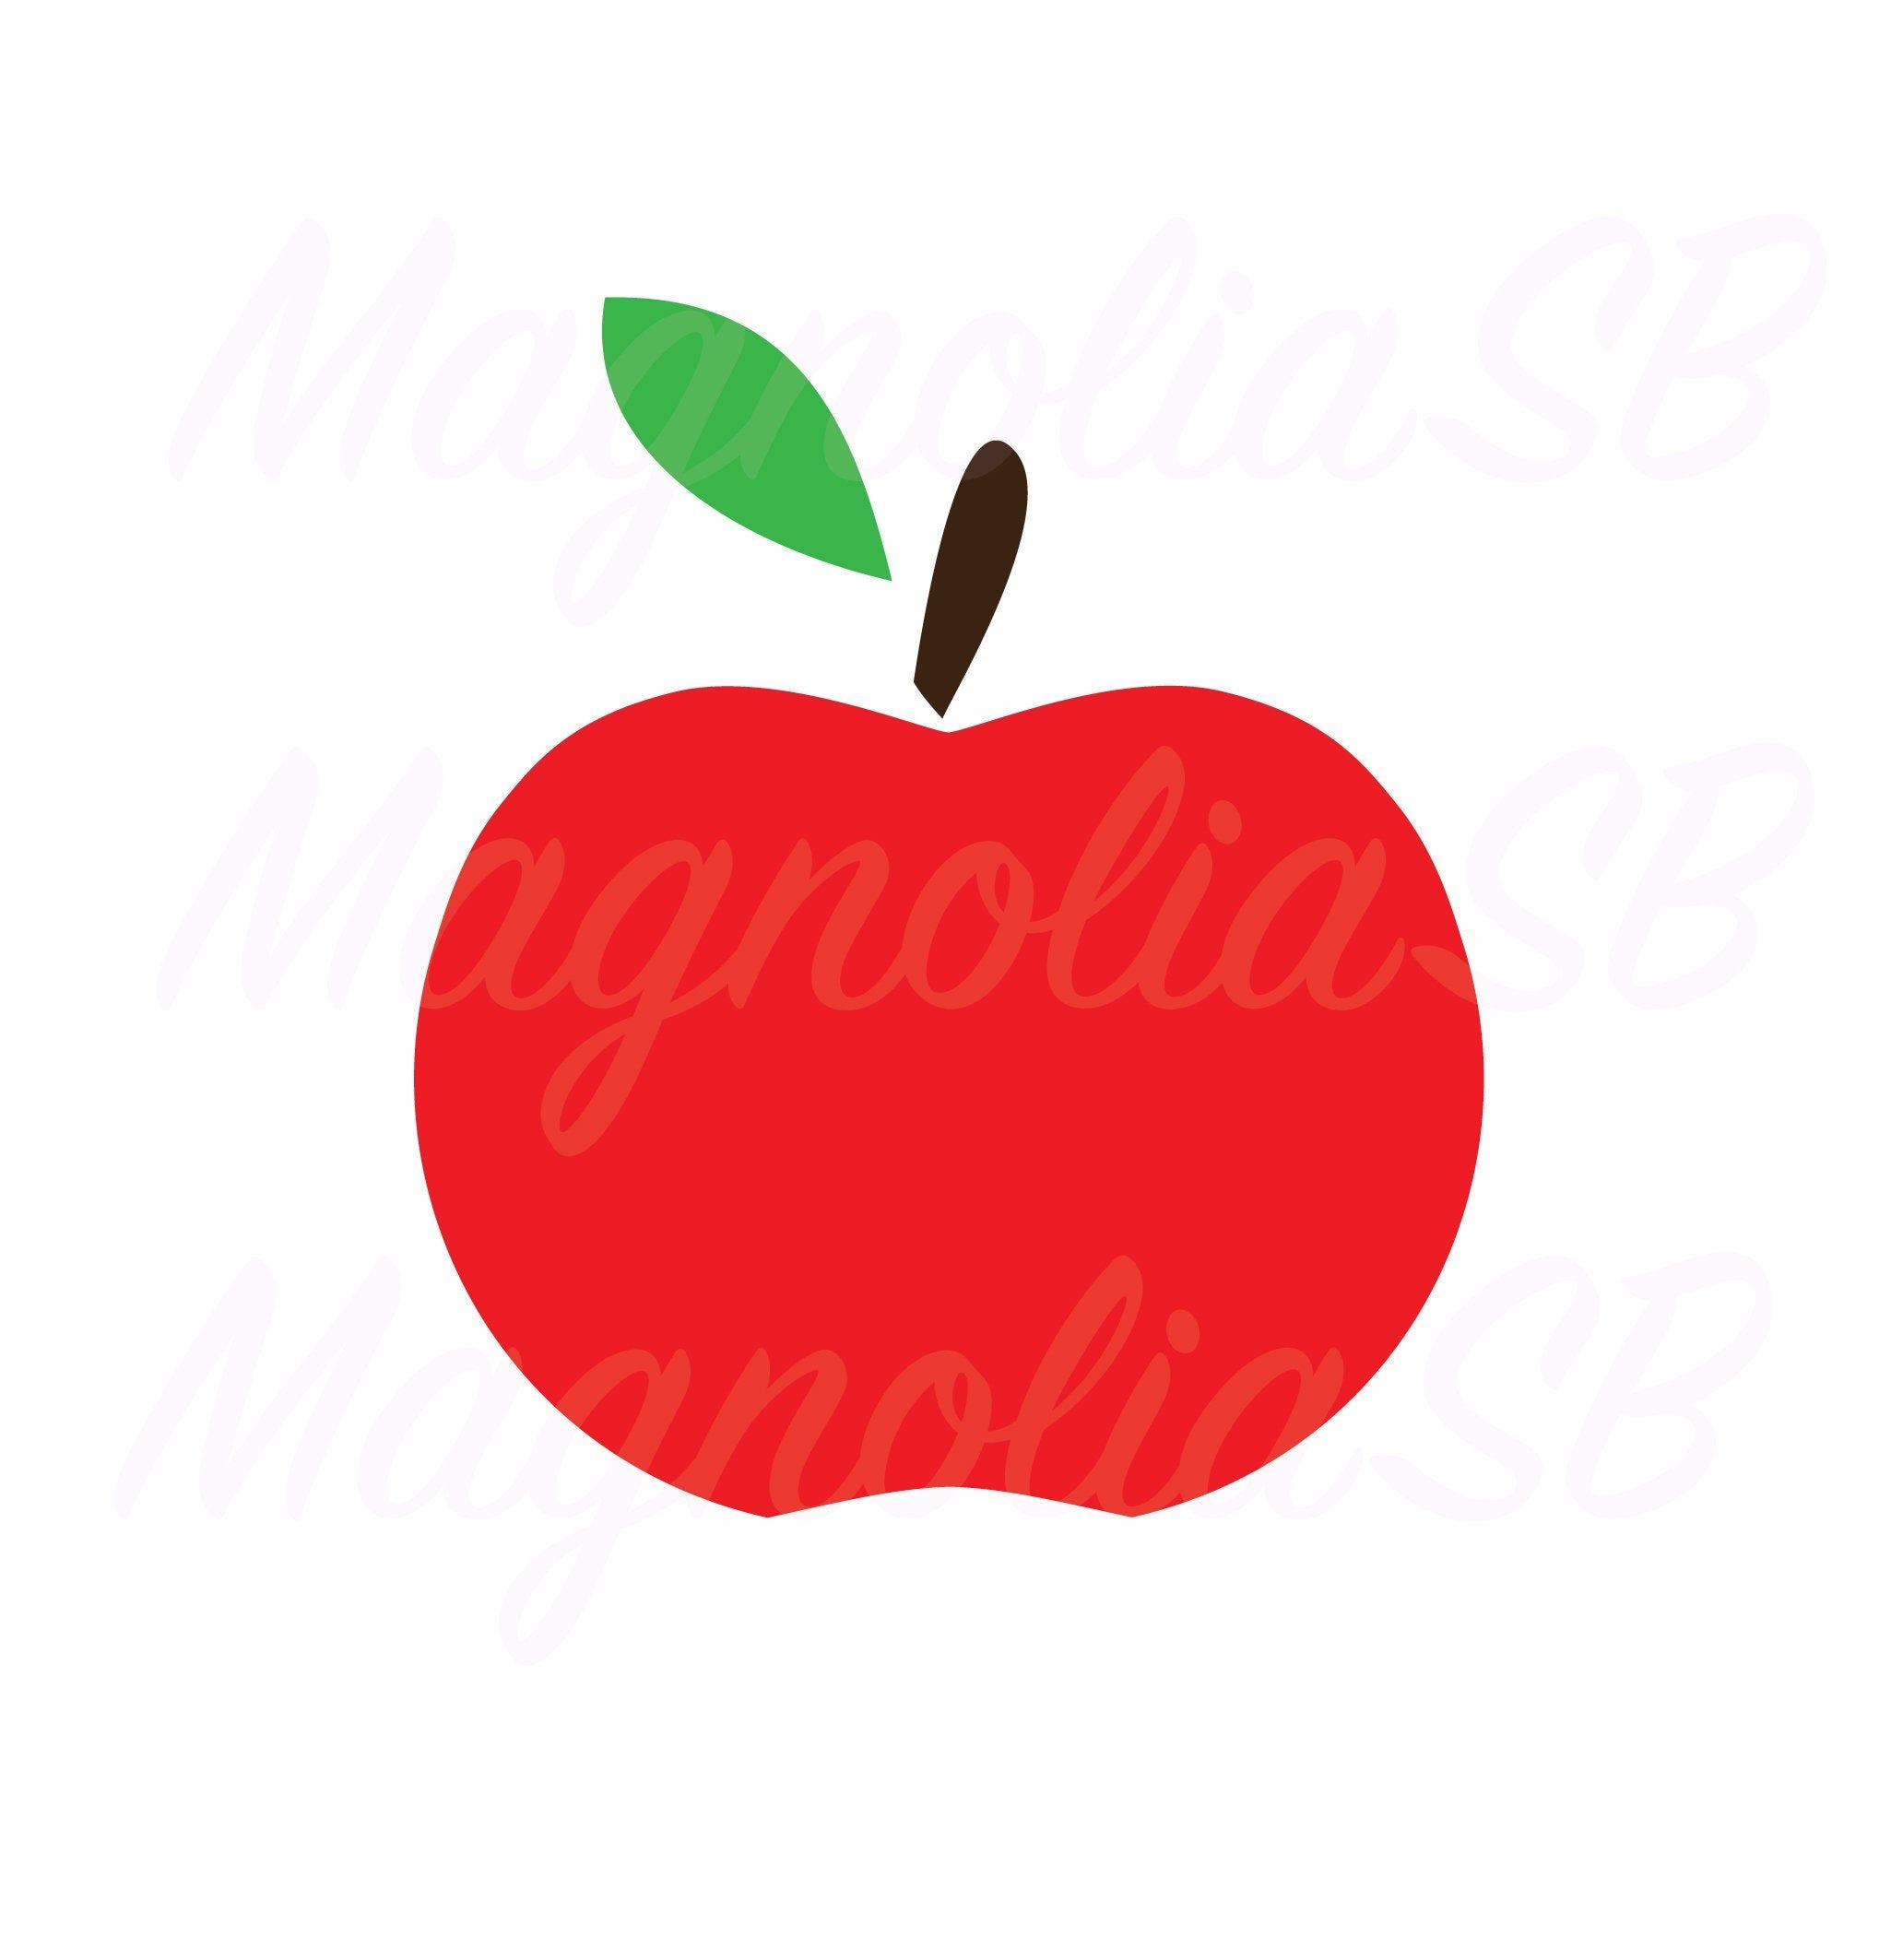 Apple Svg Dxf Apple Png Apple Silhouette Teach Apple Etsy Apple Silhouette Red Apple Dxf